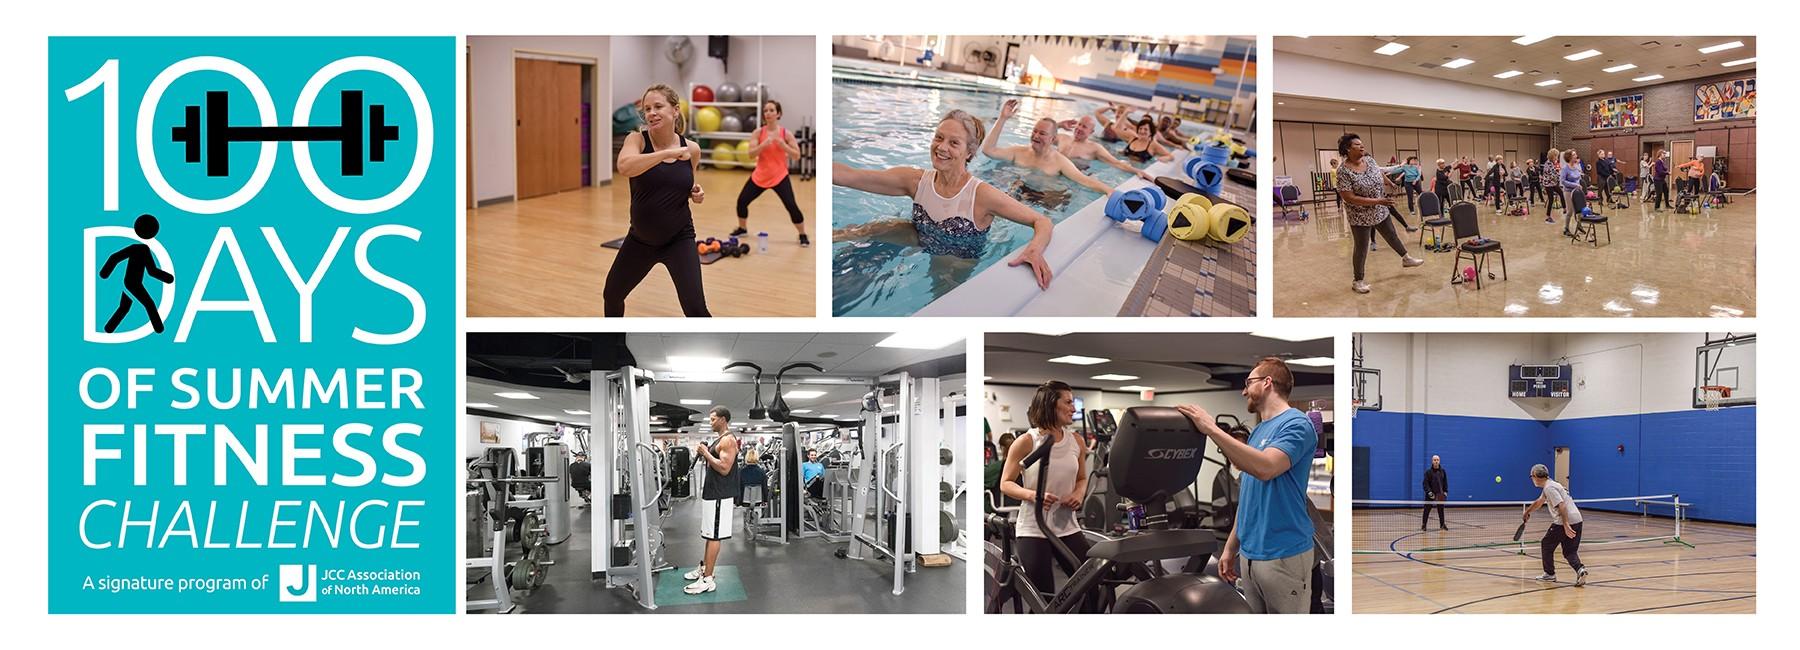 100 Days of Summer Fitness Challenge 2018.jpg